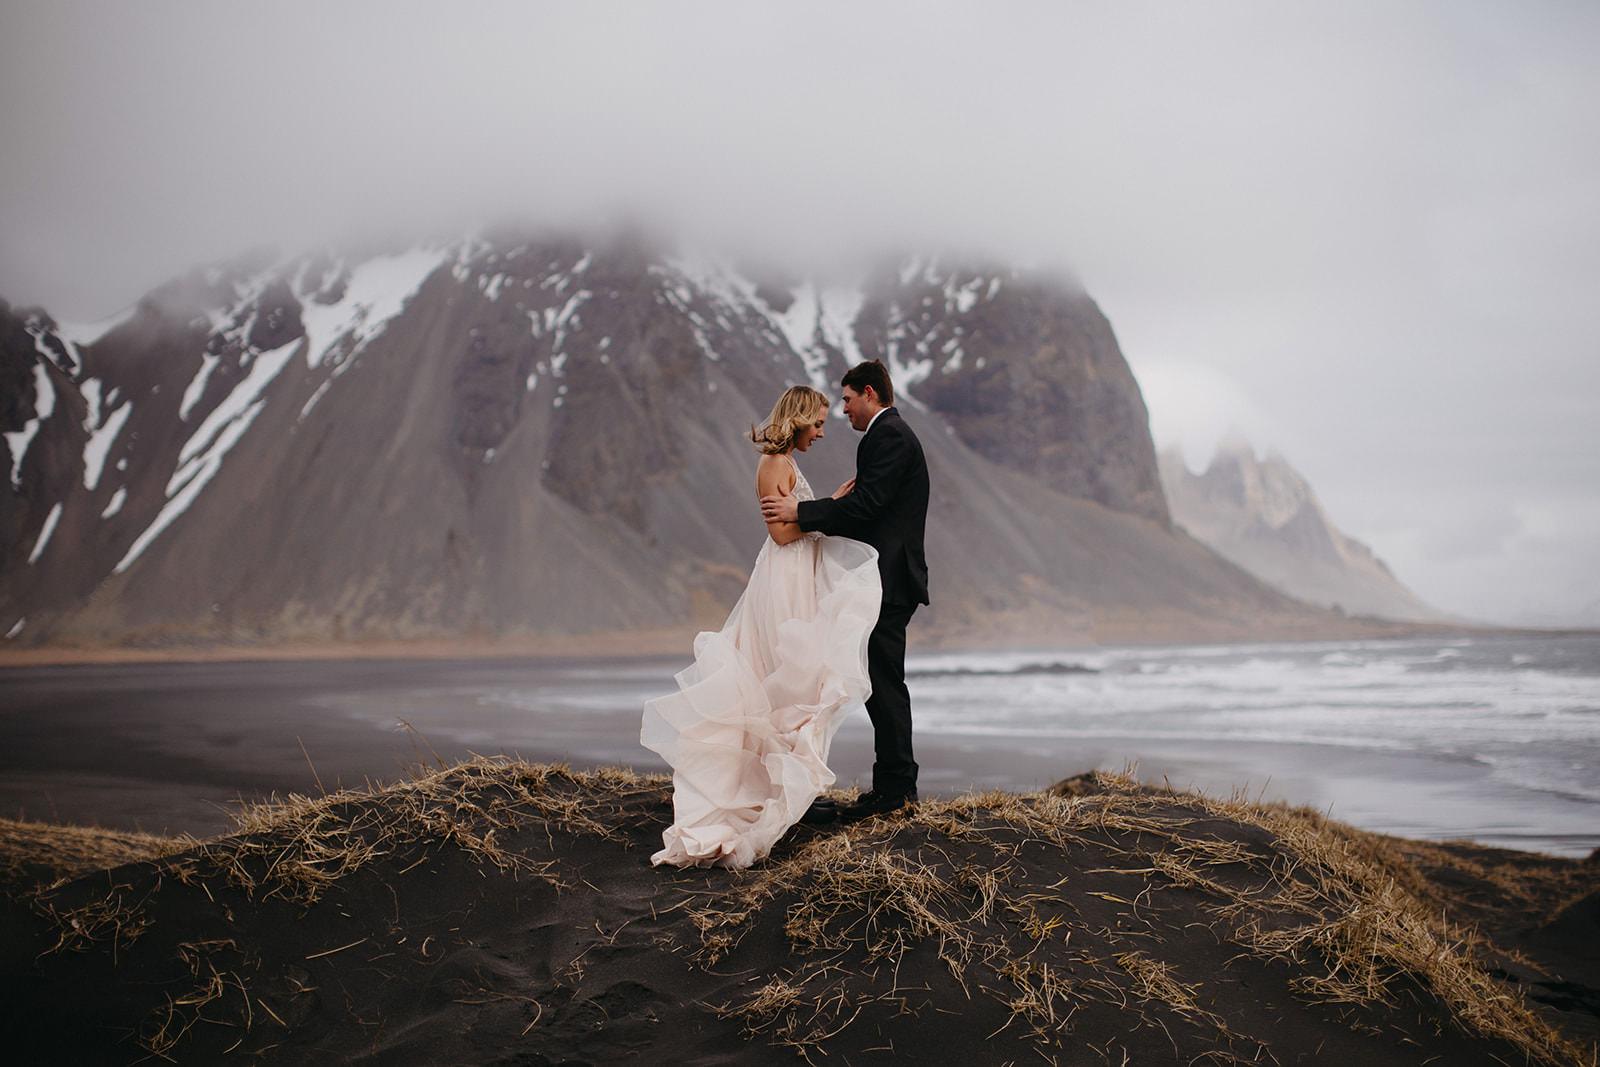 Icelandic Iceland Elopement Wedding Elope Photographer Eloping Reykjavík Vik Black Sand Beach Jökulsárlón Skogafoss Waterfall Vestrahorn Mountain Liz Osban Photography Destination 29.jpg